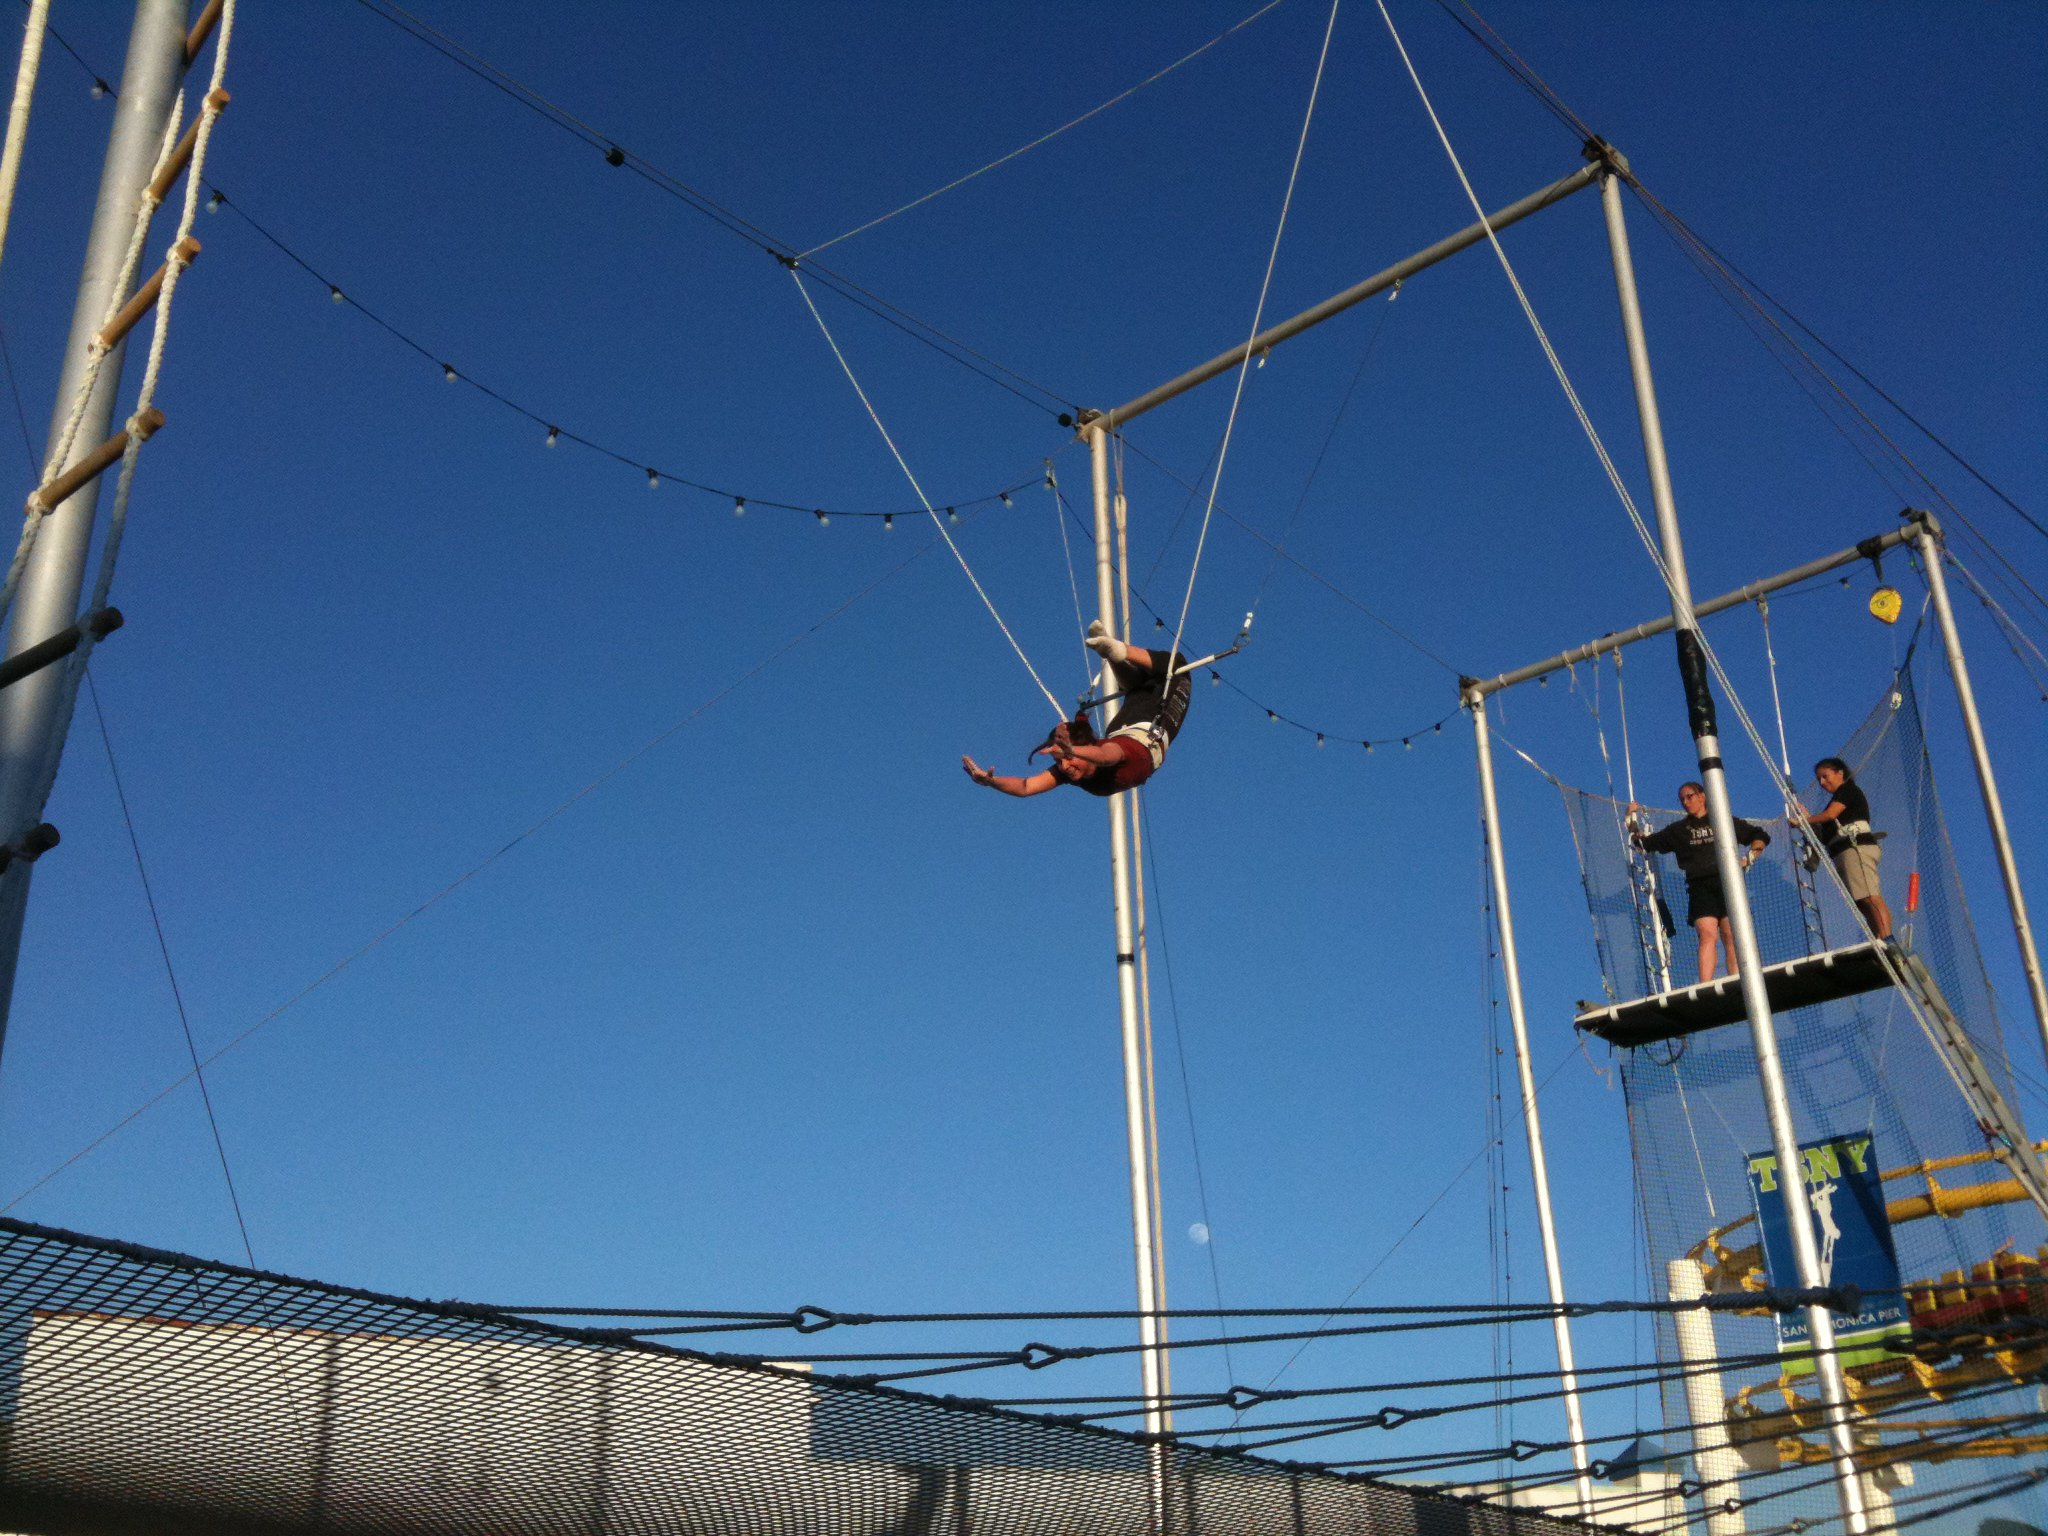 courtney_hoskins_on_flying_trapeze.jpg